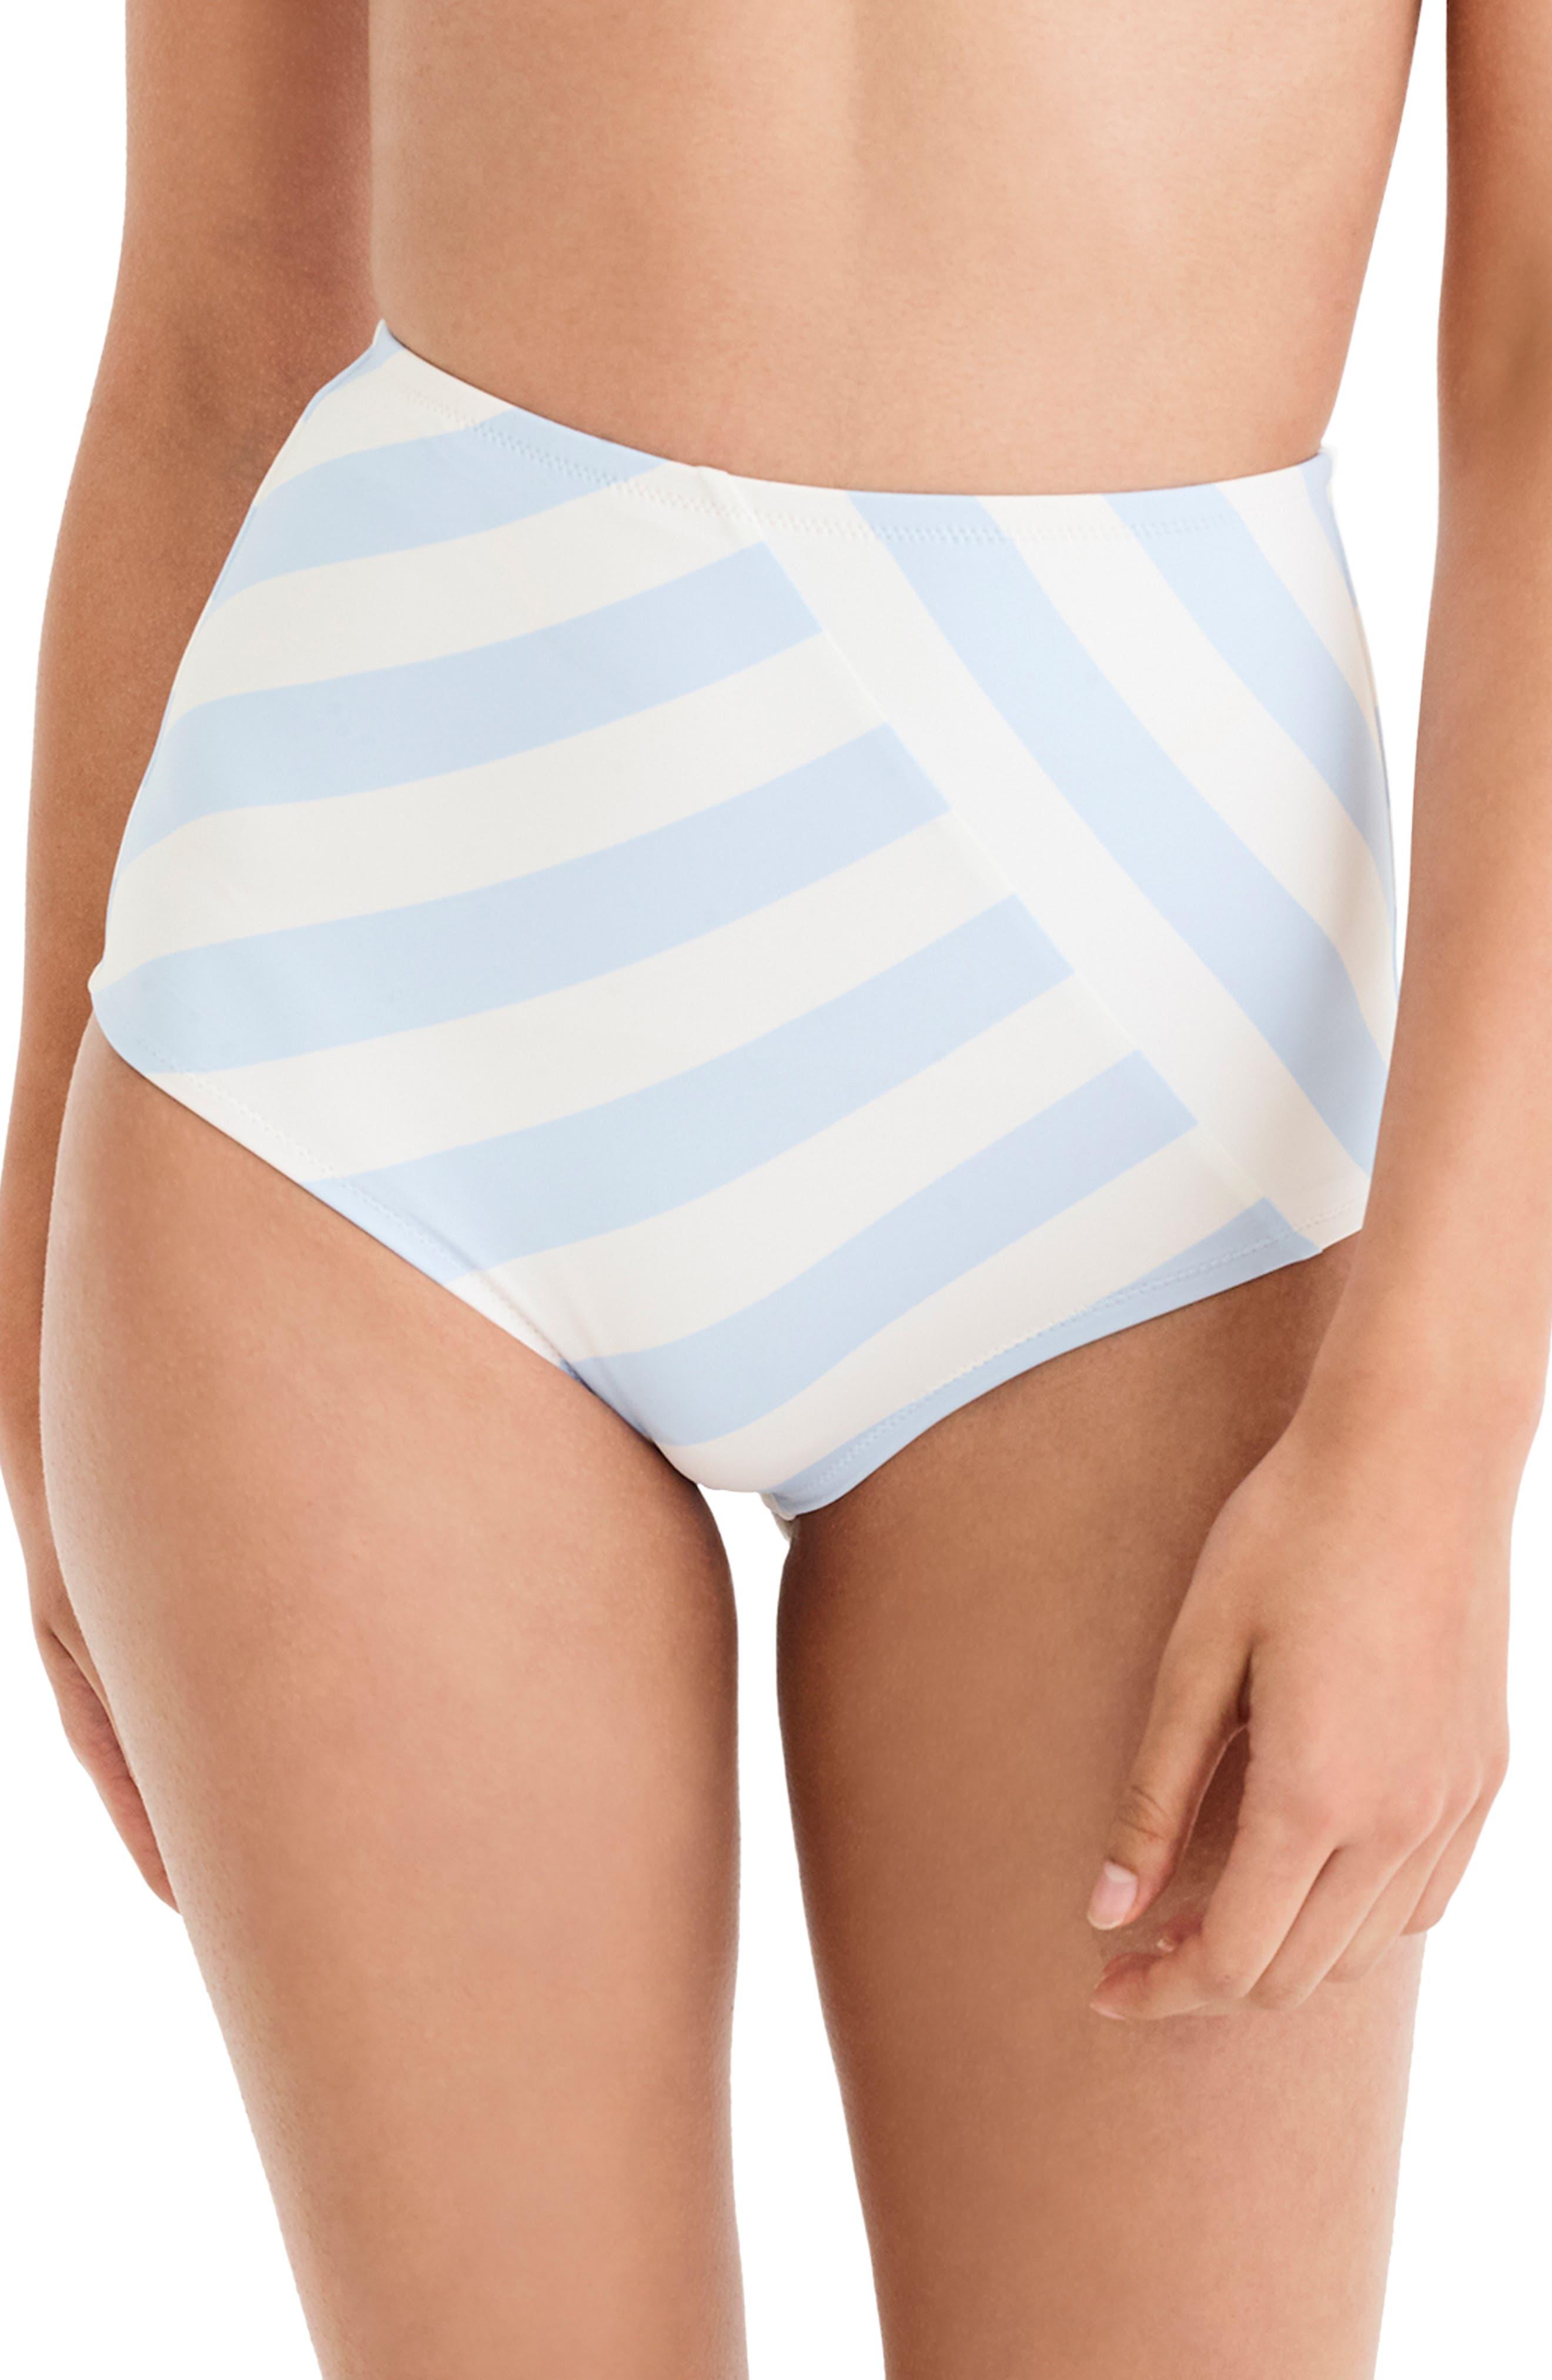 J.CREW, Stripe Seamless High Waist Bikini Bottoms, Main thumbnail 1, color, 400